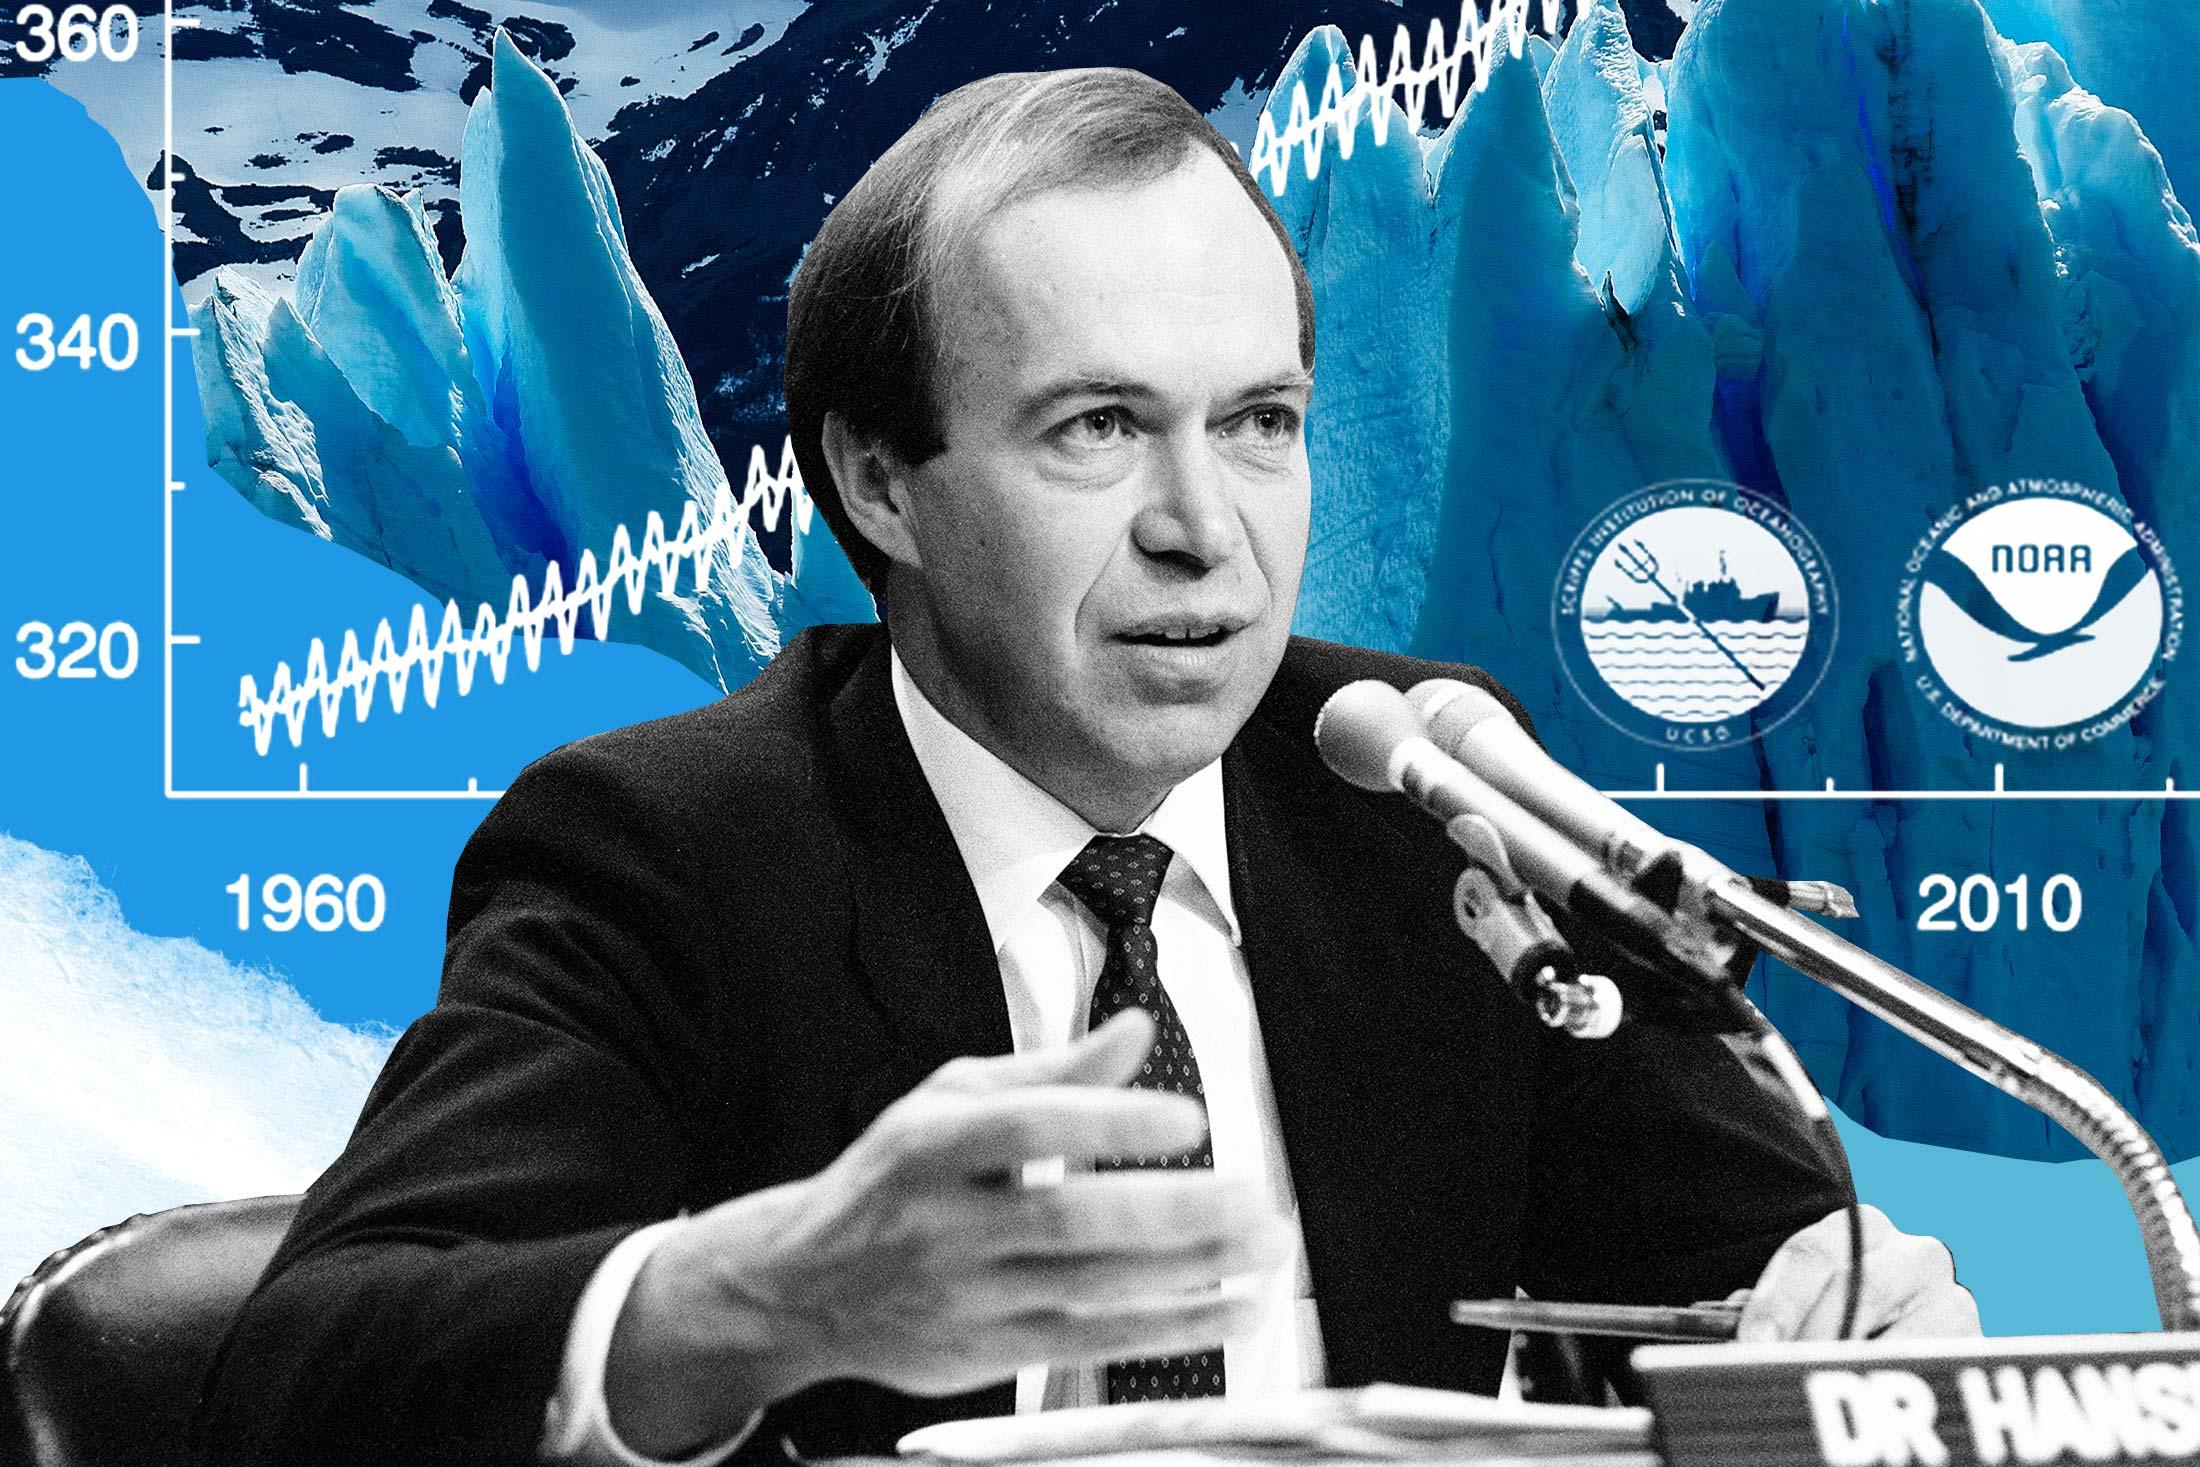 James Hansen collaged in front of the Perito Moreno glacier in Argentina.